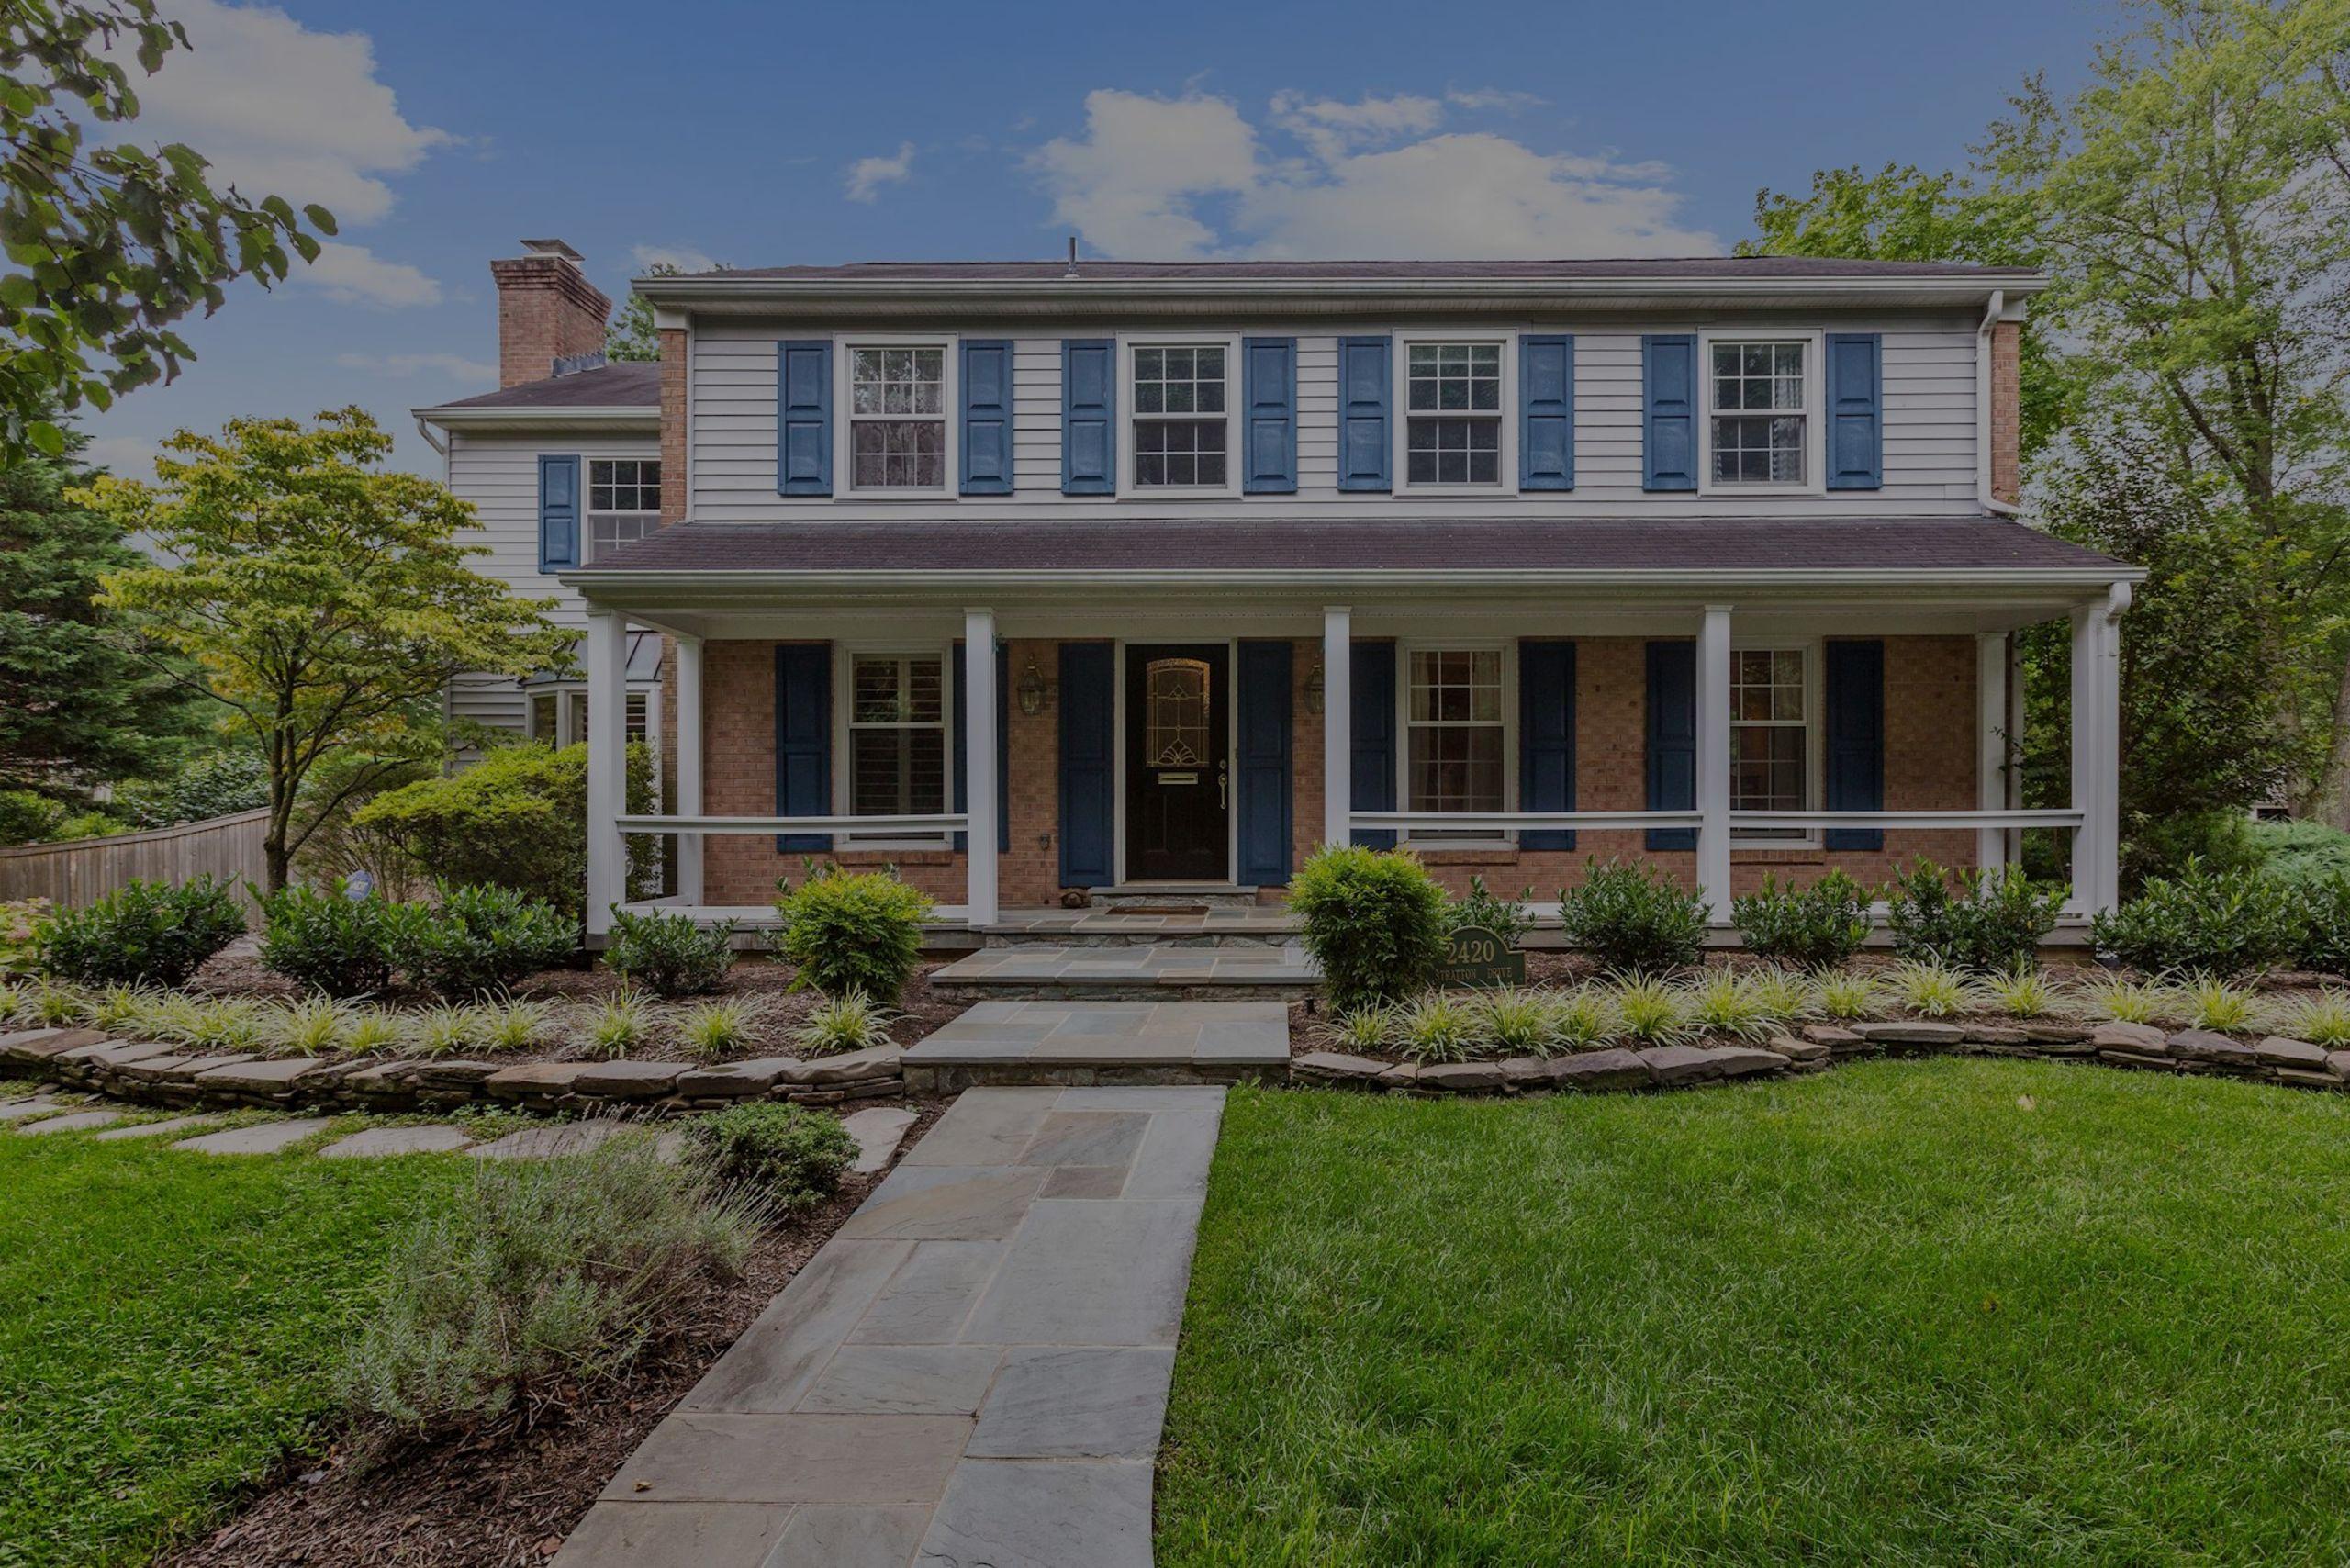 Sold: 2420 Stratton Drive, Potomac, MD